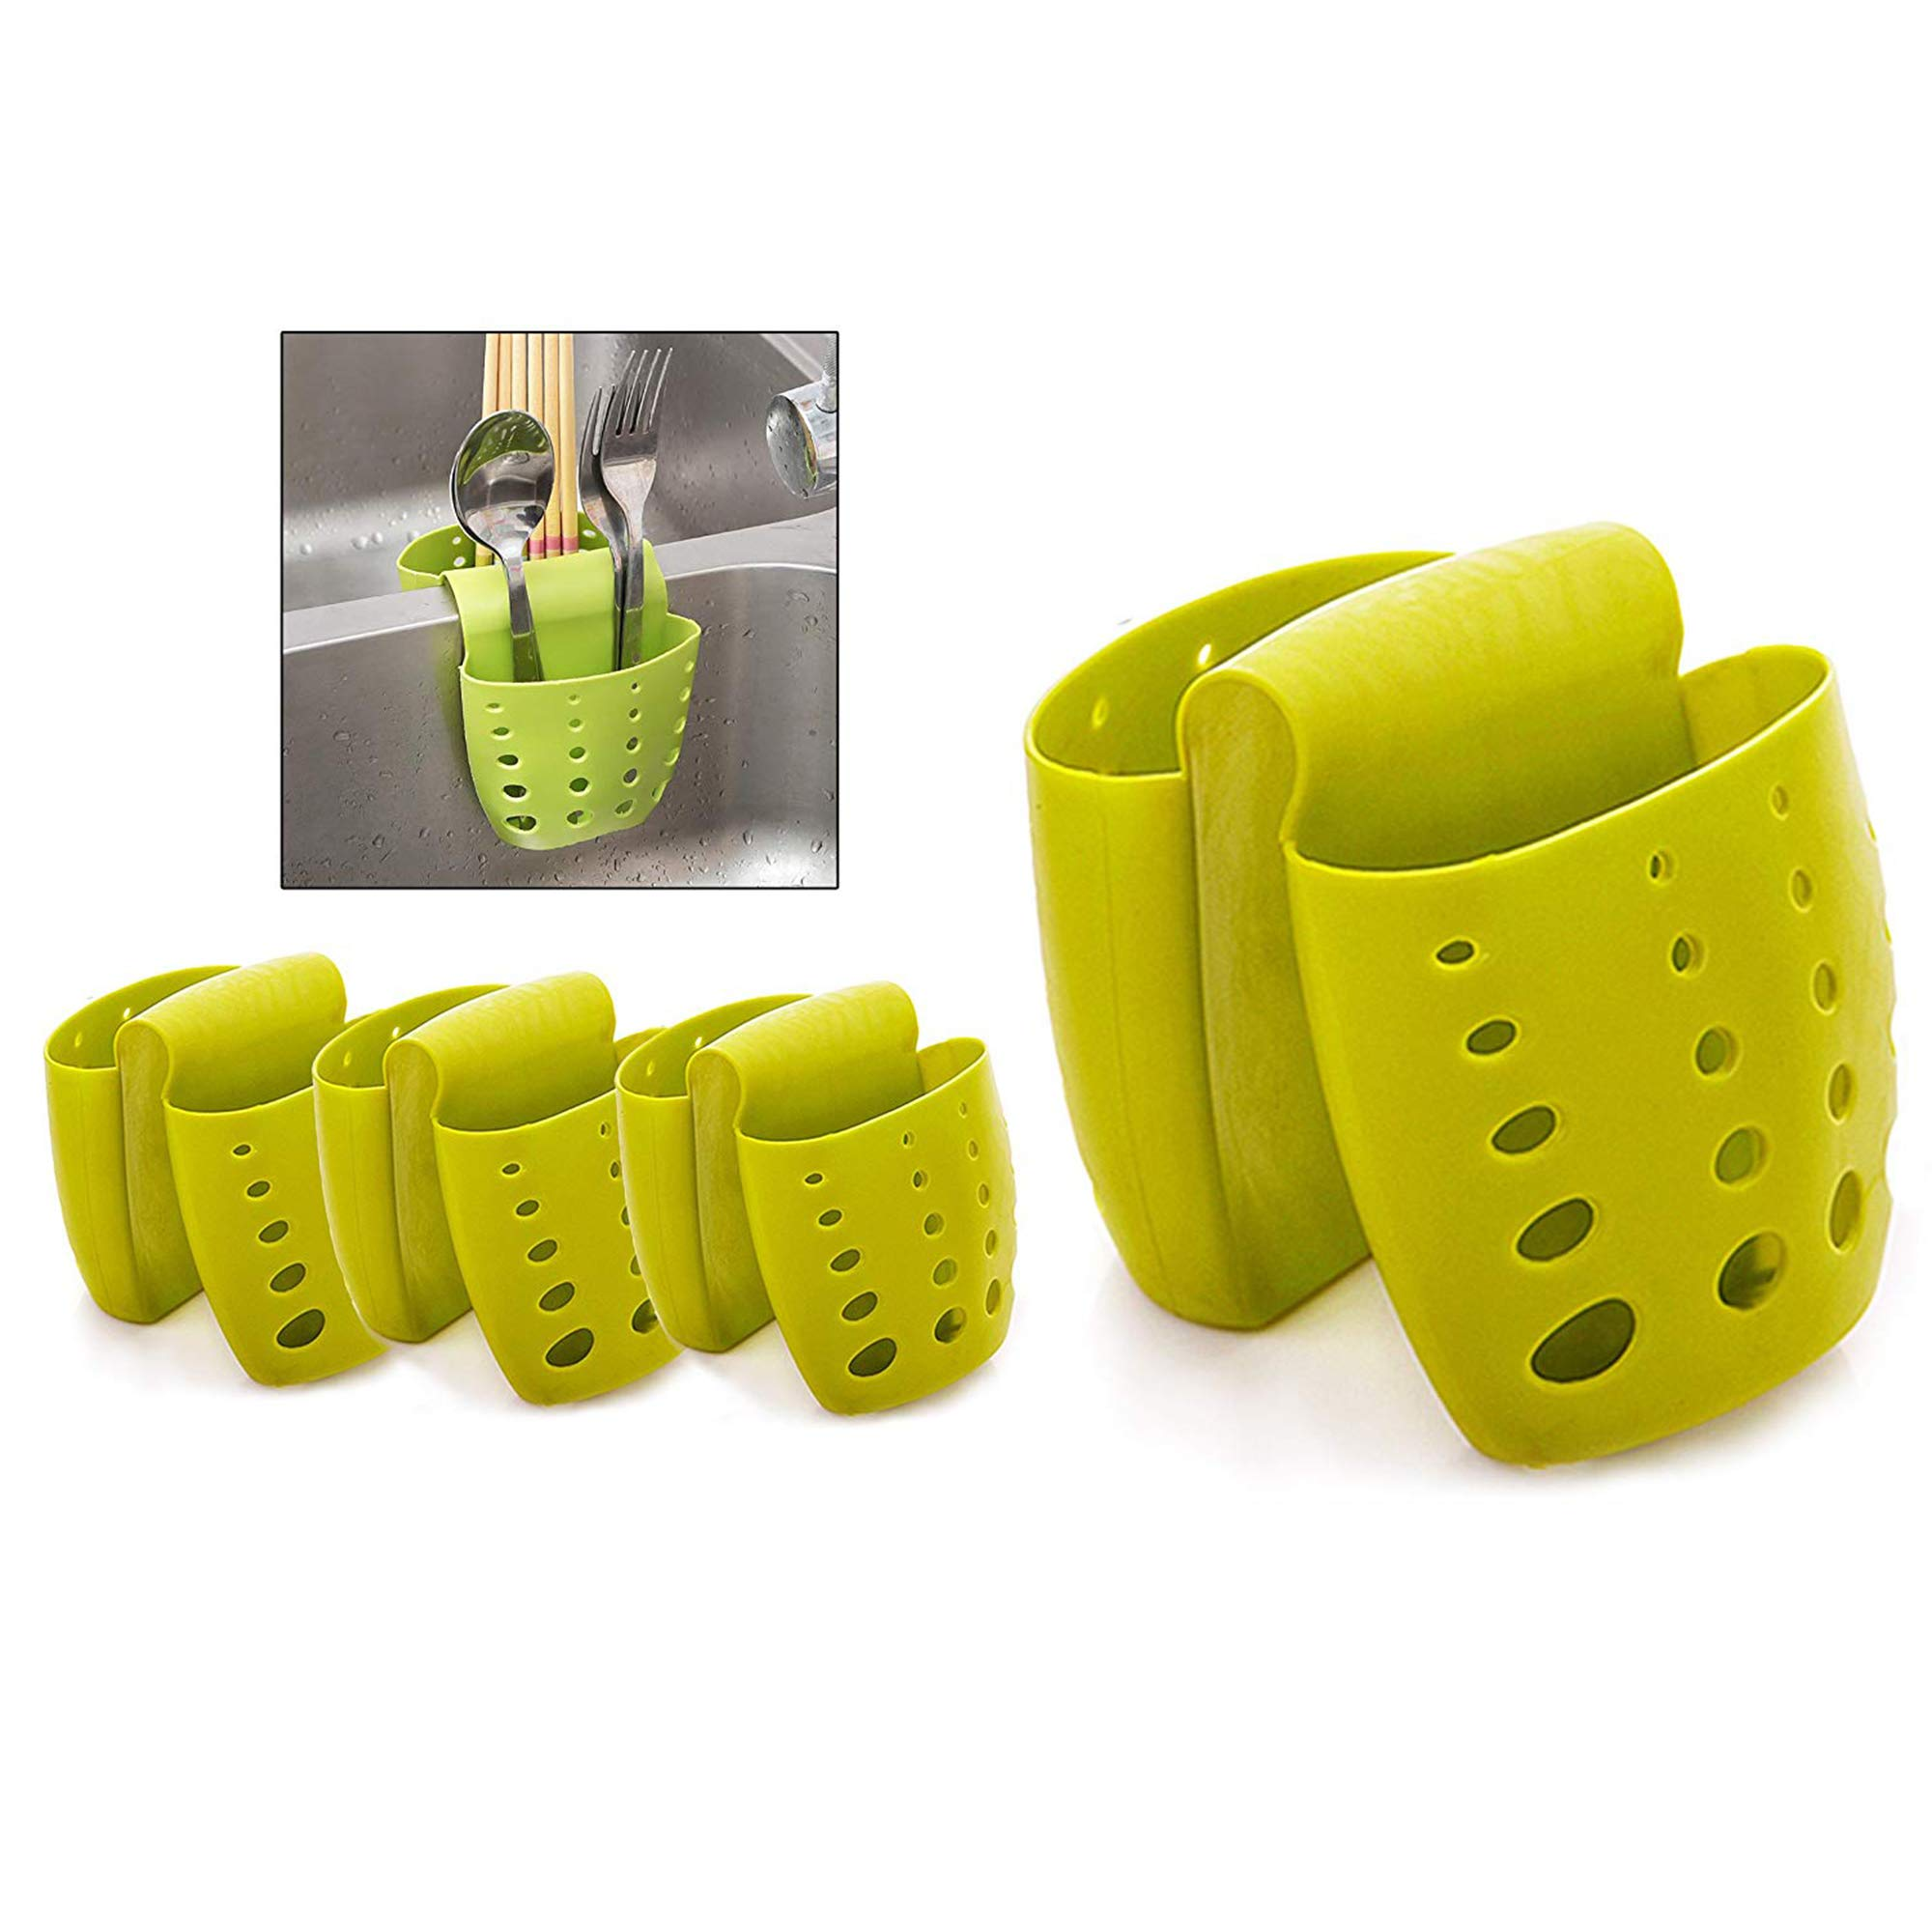 4PCS Sponge Sink Holder,Hanging Silicone Kitchen Gadget Storage Organizer,Baskets Drain Bag (Green)